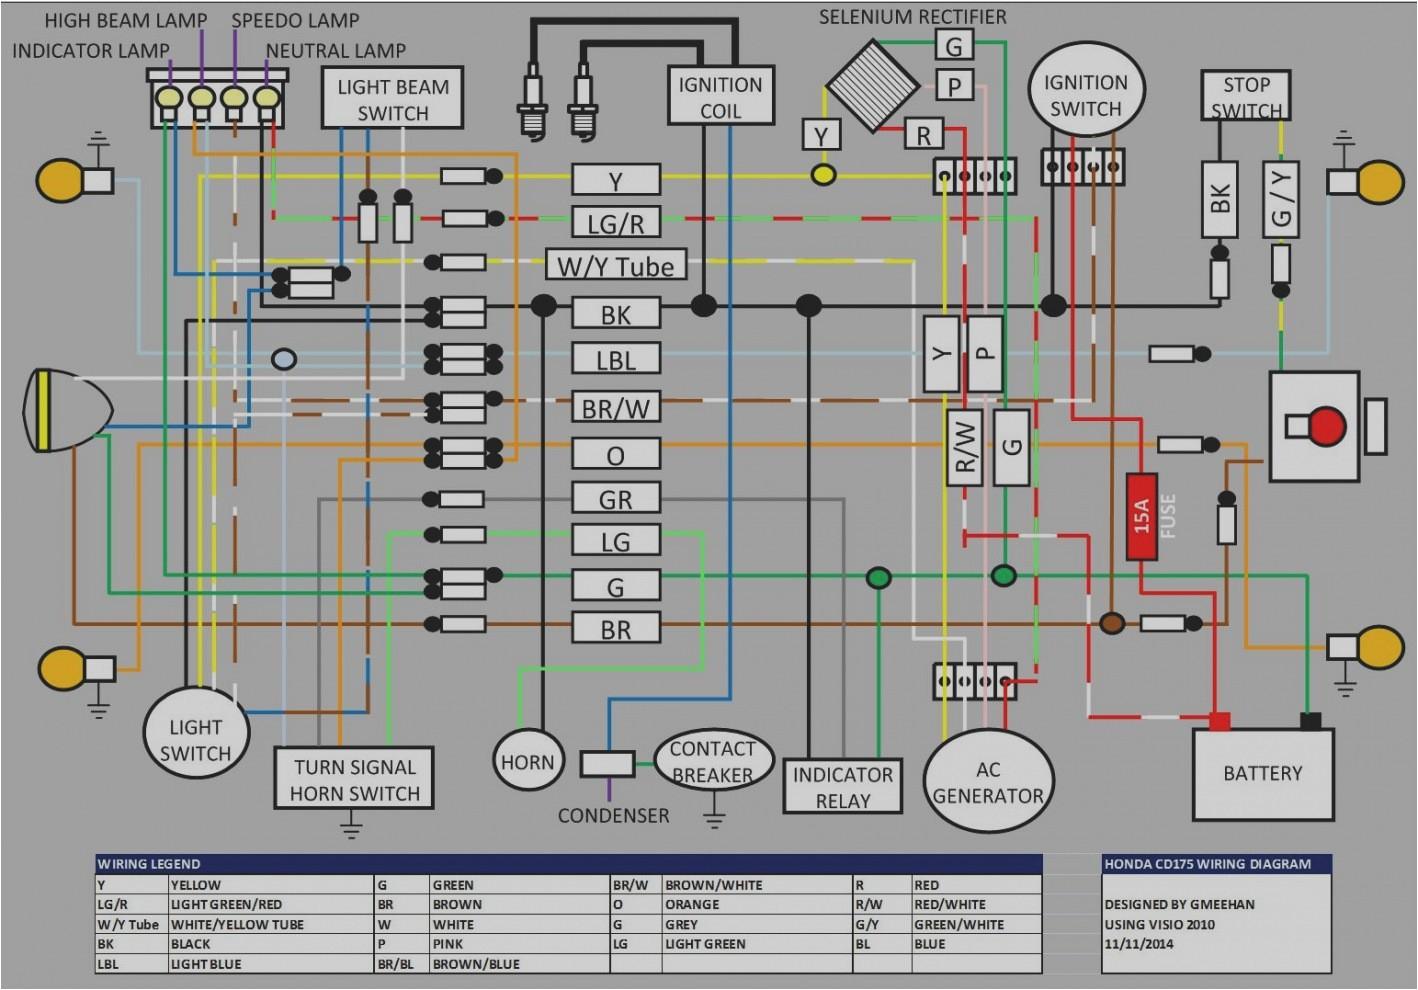 honda lead 125 wiring diagram wiring diagram article review honda lead 125 wiring diagram